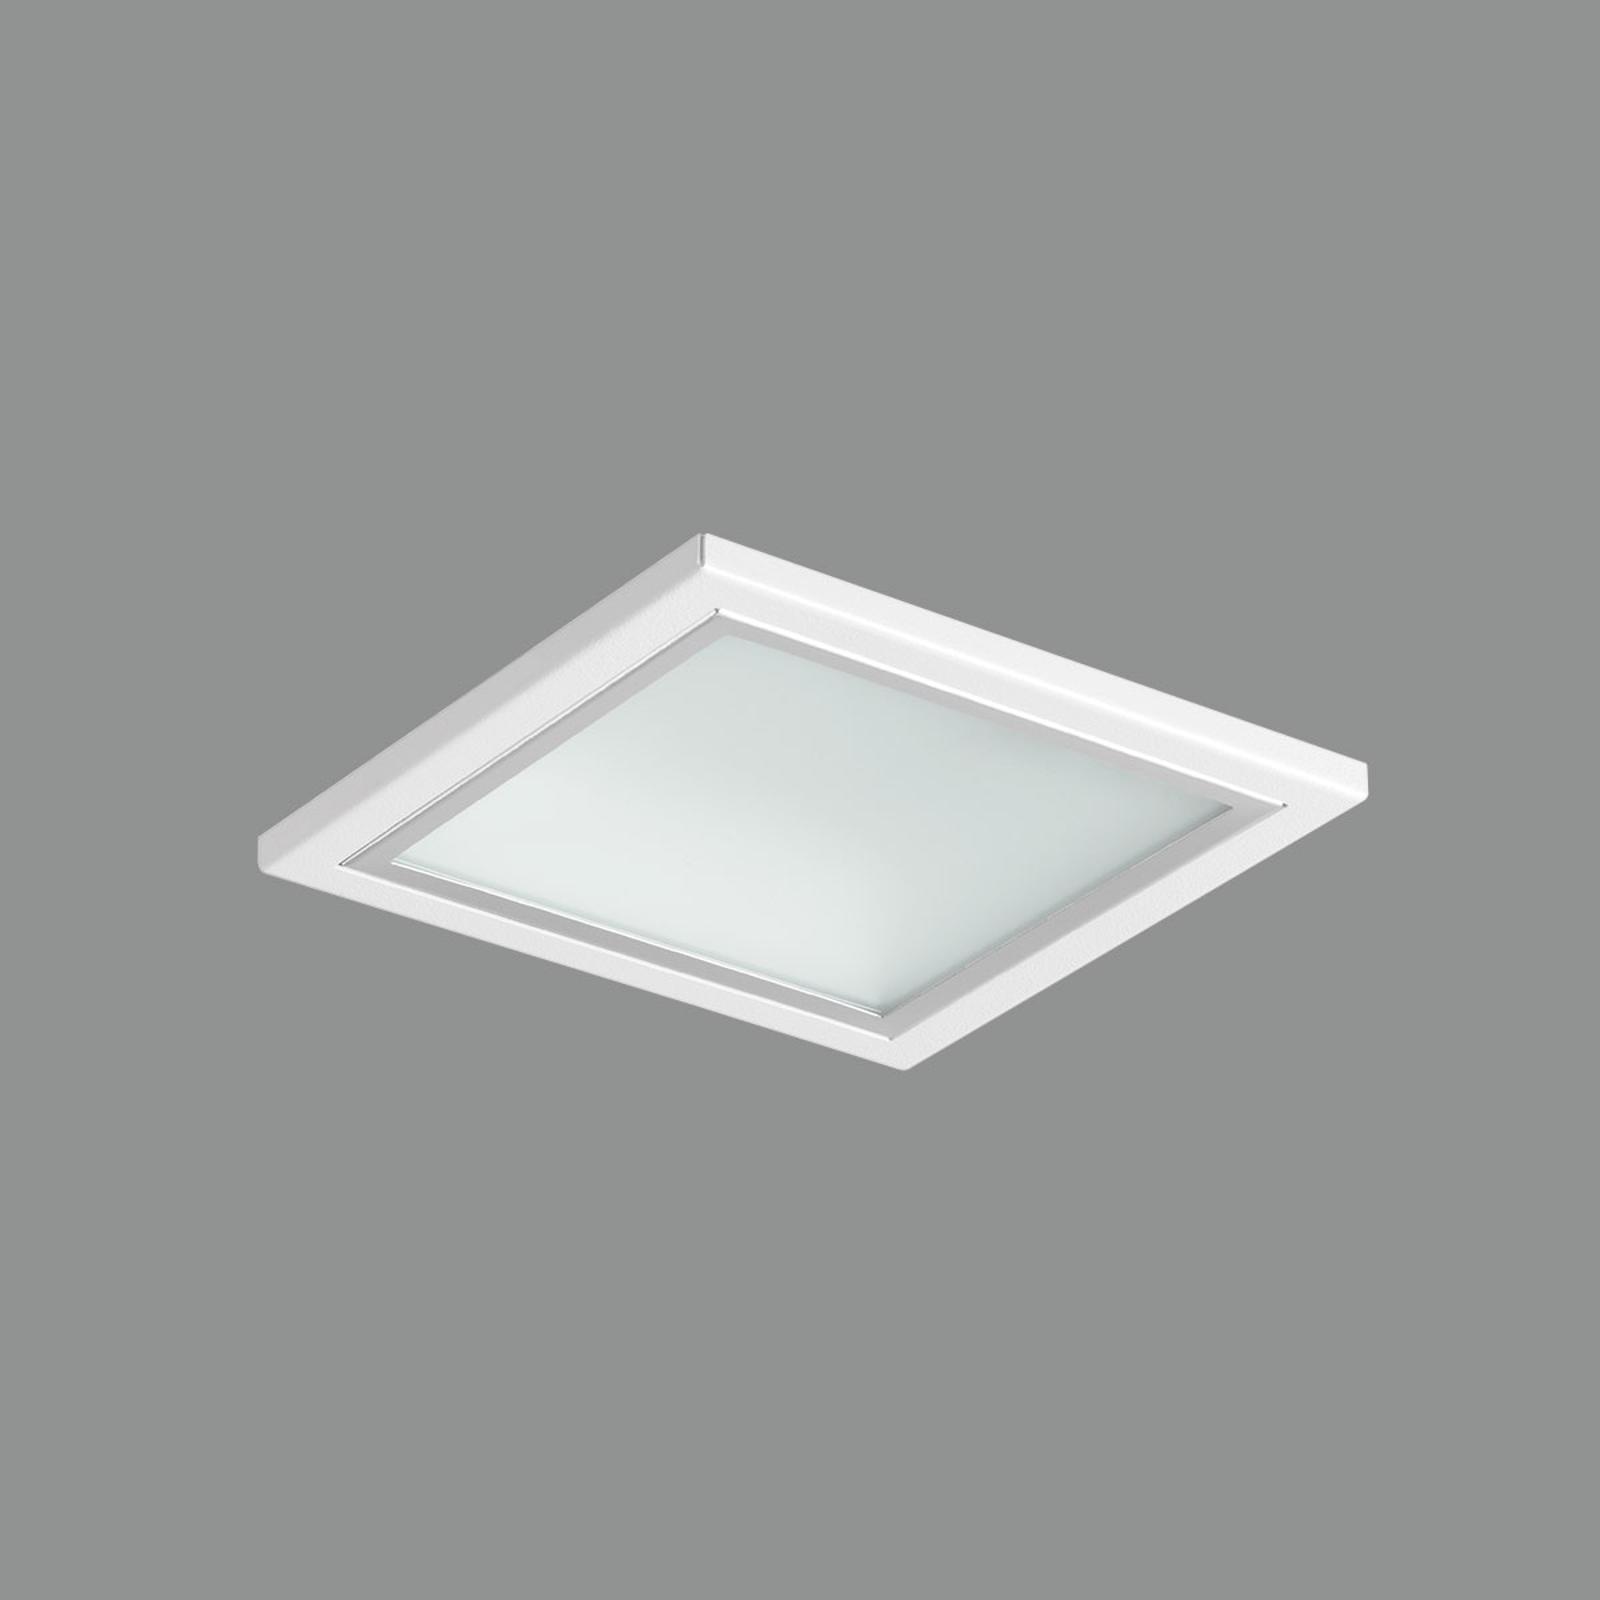 LED downlight Noviel S PRO, 20 W, 79°, 4.000 K